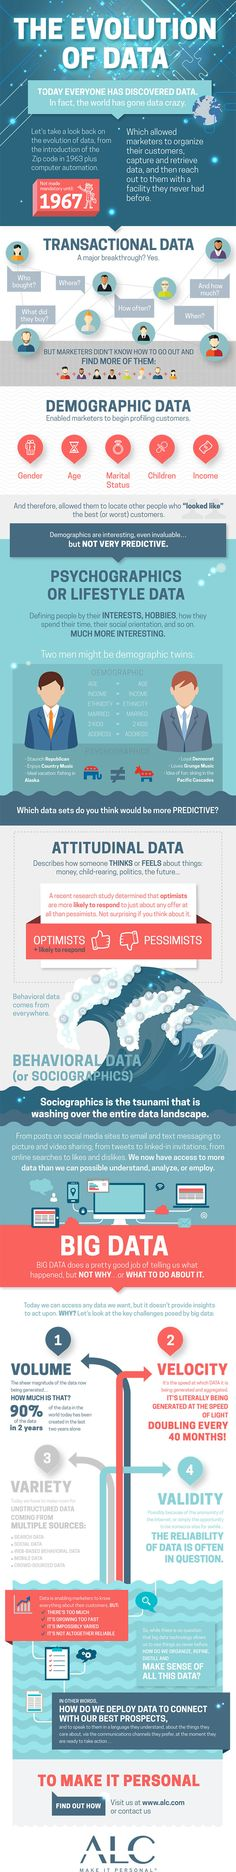 The Evolution of Data #infographic #Data #BigData